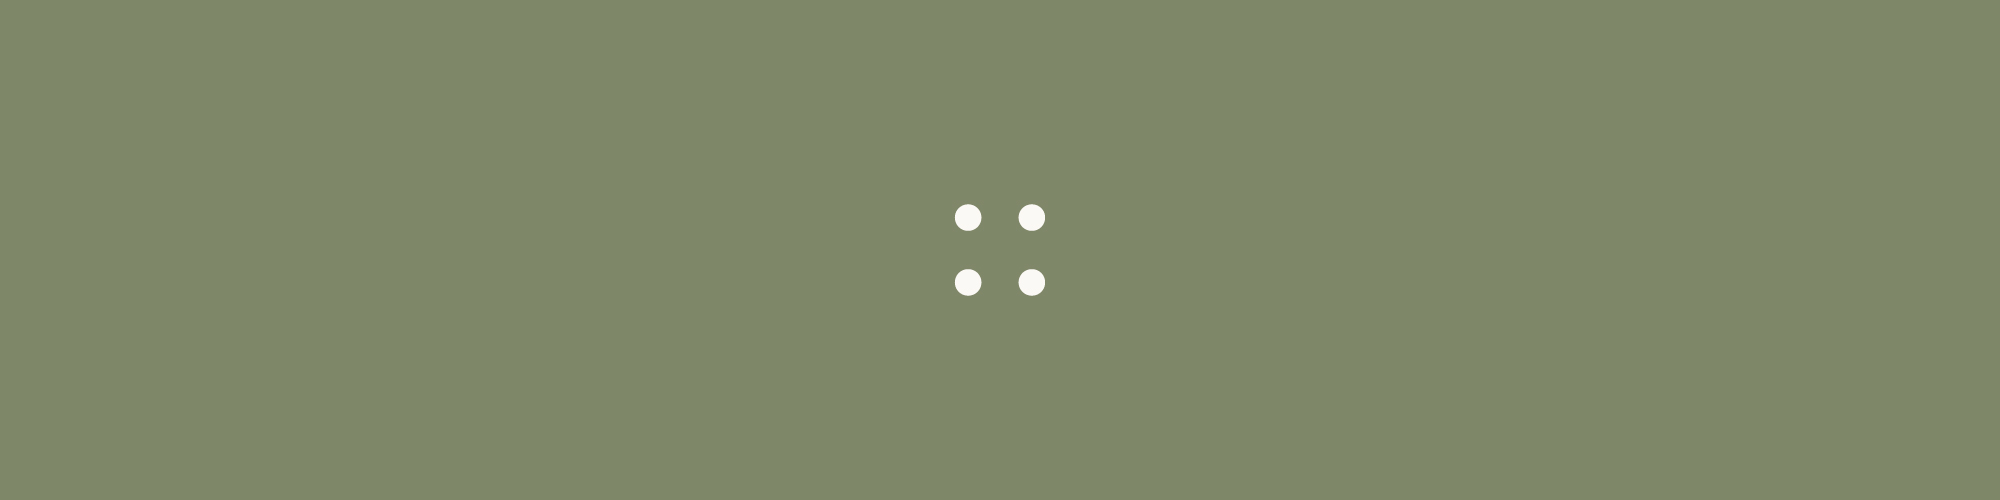 U&Boo-Icon.jpg